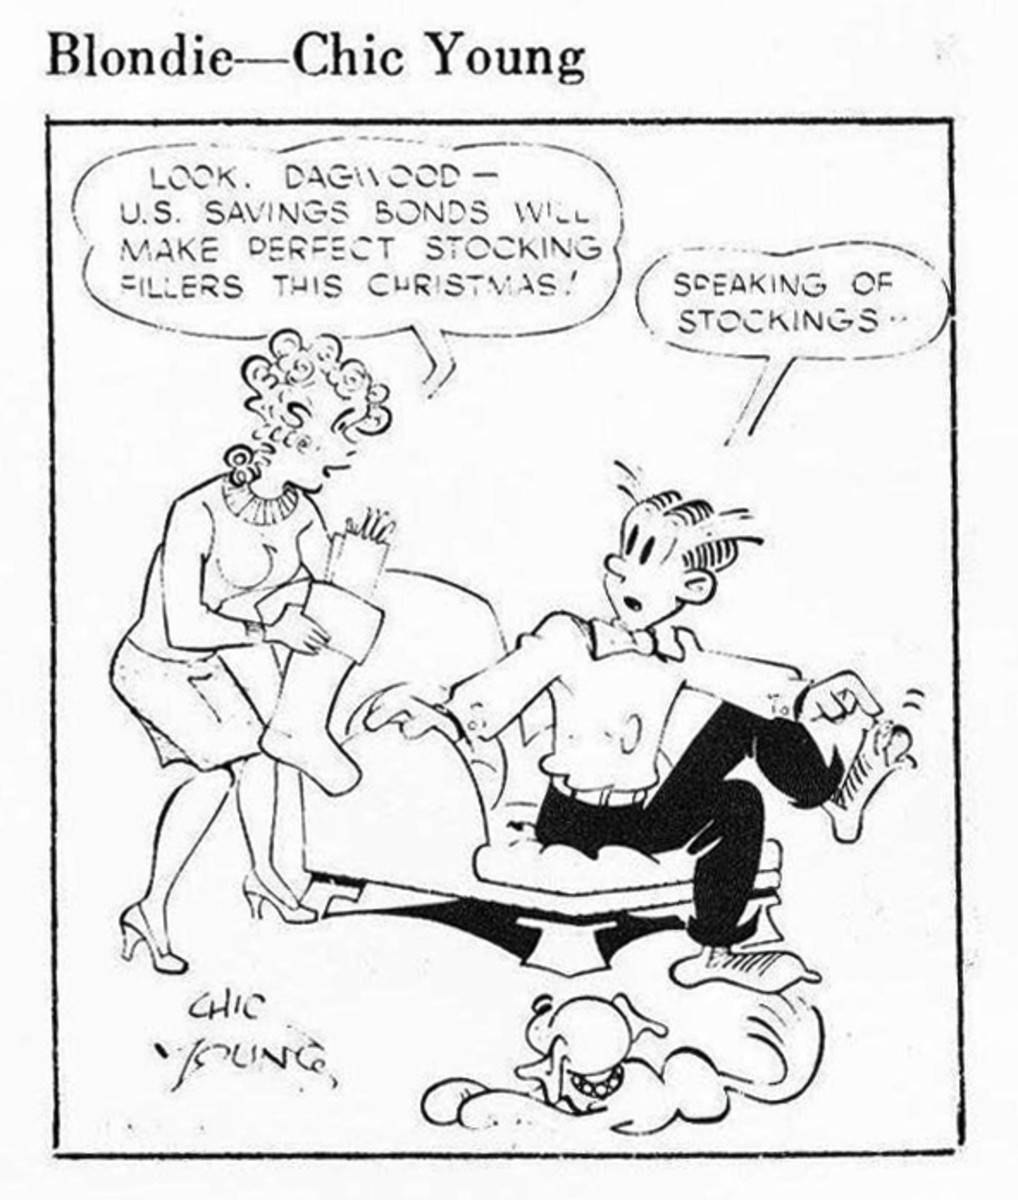 Look, Dagwood - U.S. Savings Bonds Will Make Perfect Stocking Fillers  This Christmas! (AD 1971)